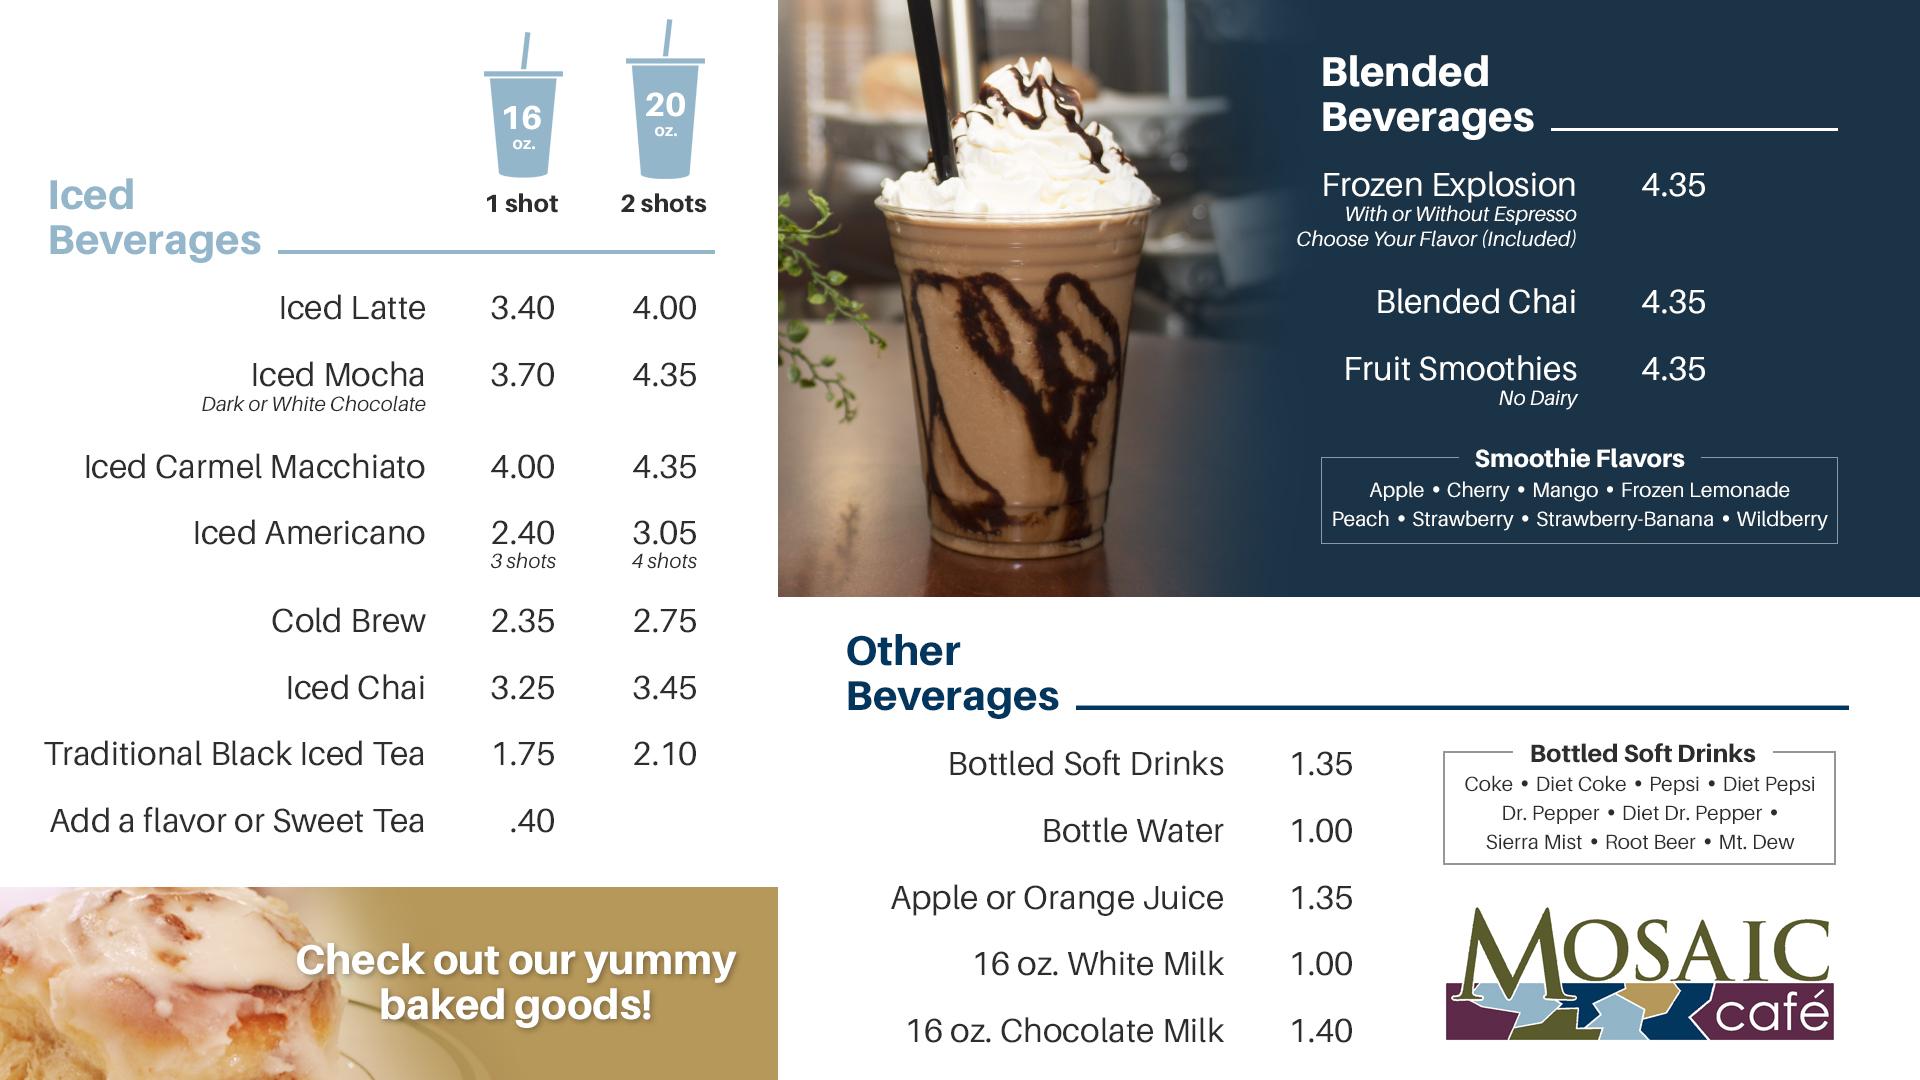 Mosaic Cafe - Cold Menu (baked goods frozen expl)